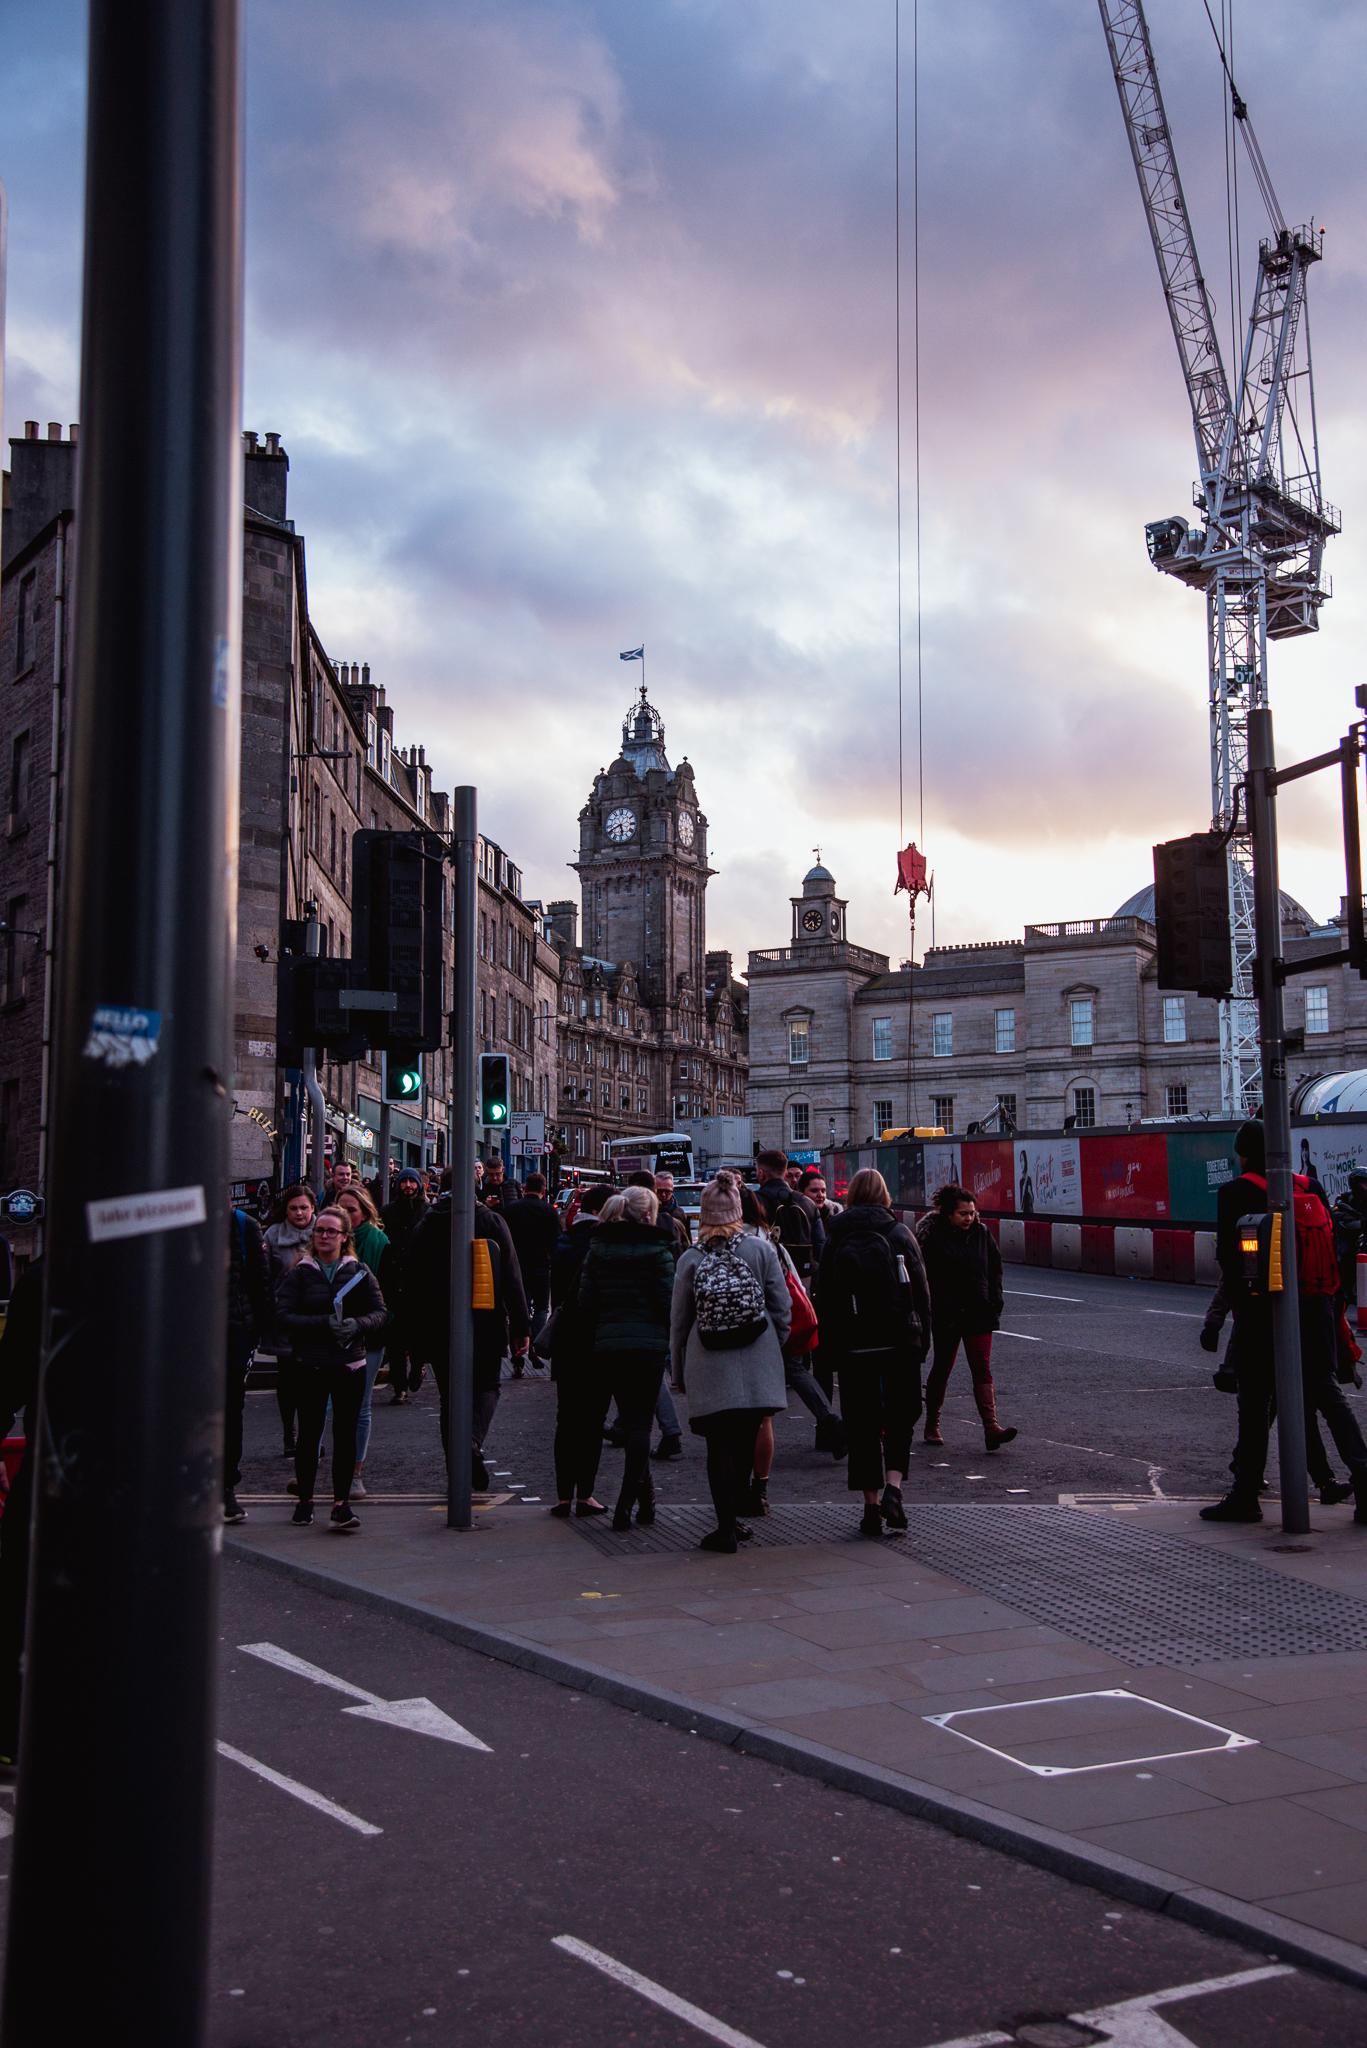 edinburgh, scotland , uk, city, architecture, sunset, buildings